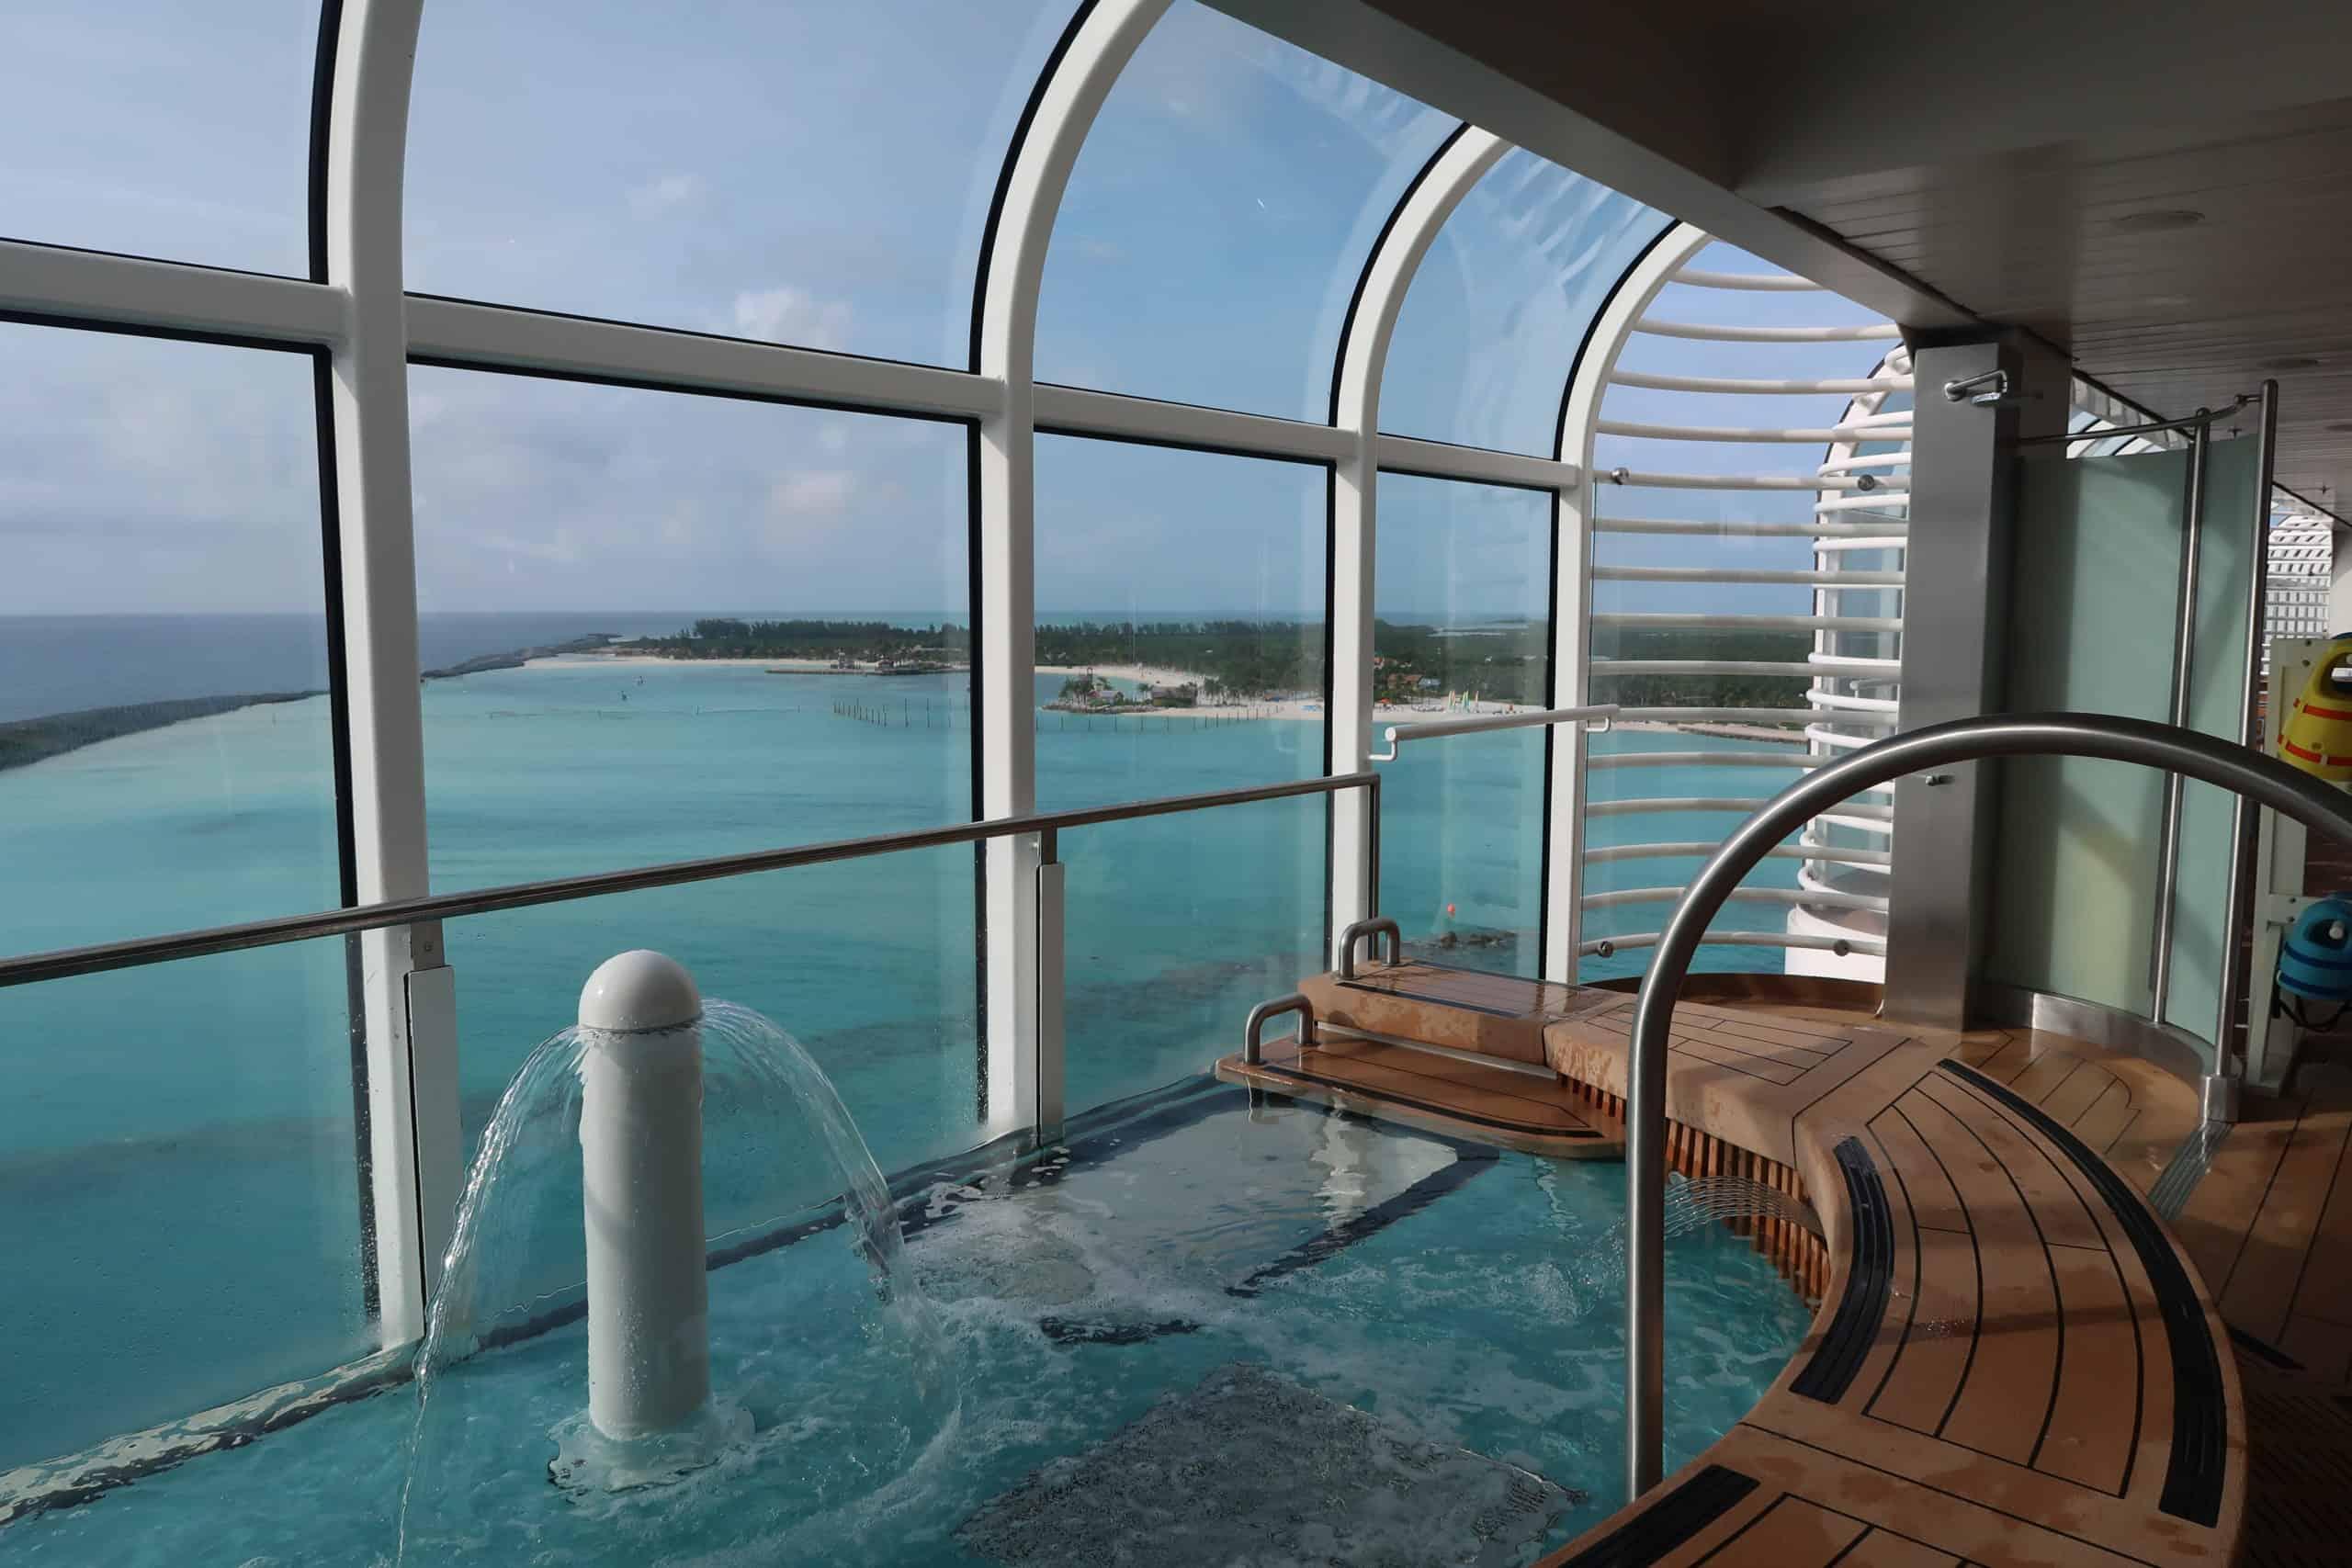 Disney Dream Cruise cost